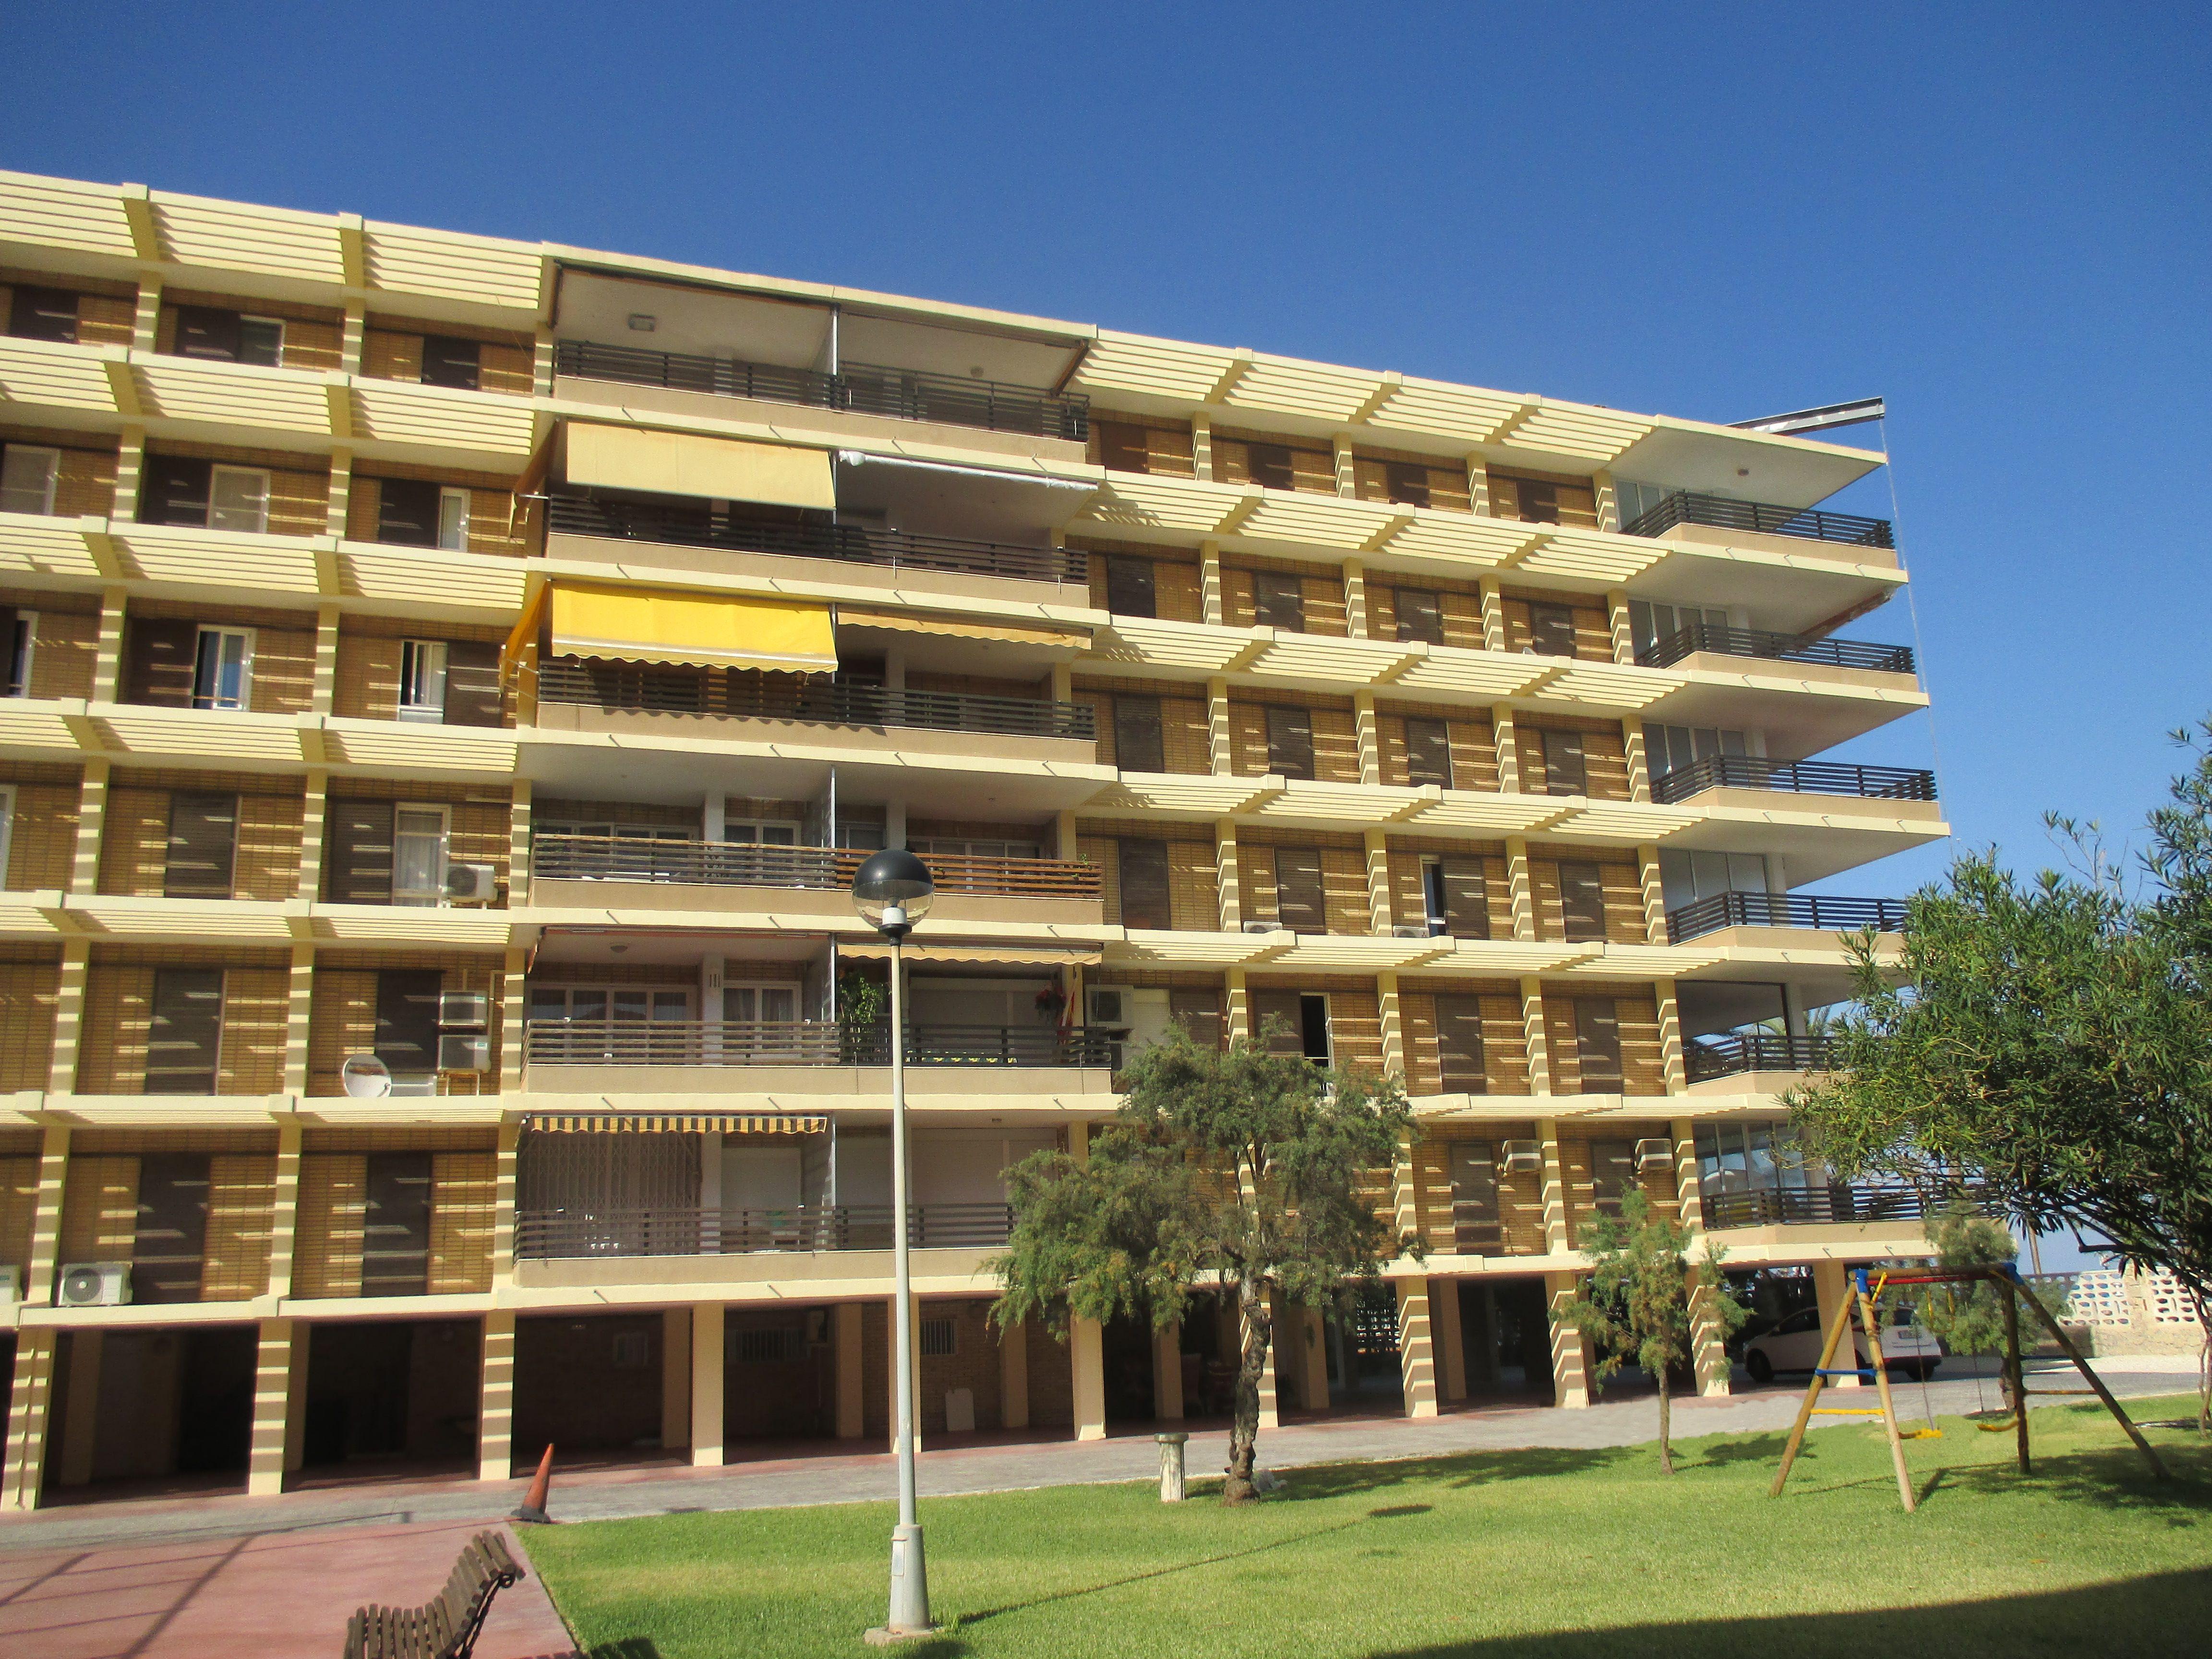 Rehabilitación Edificio de Viviendas Alhambra (Alicante)